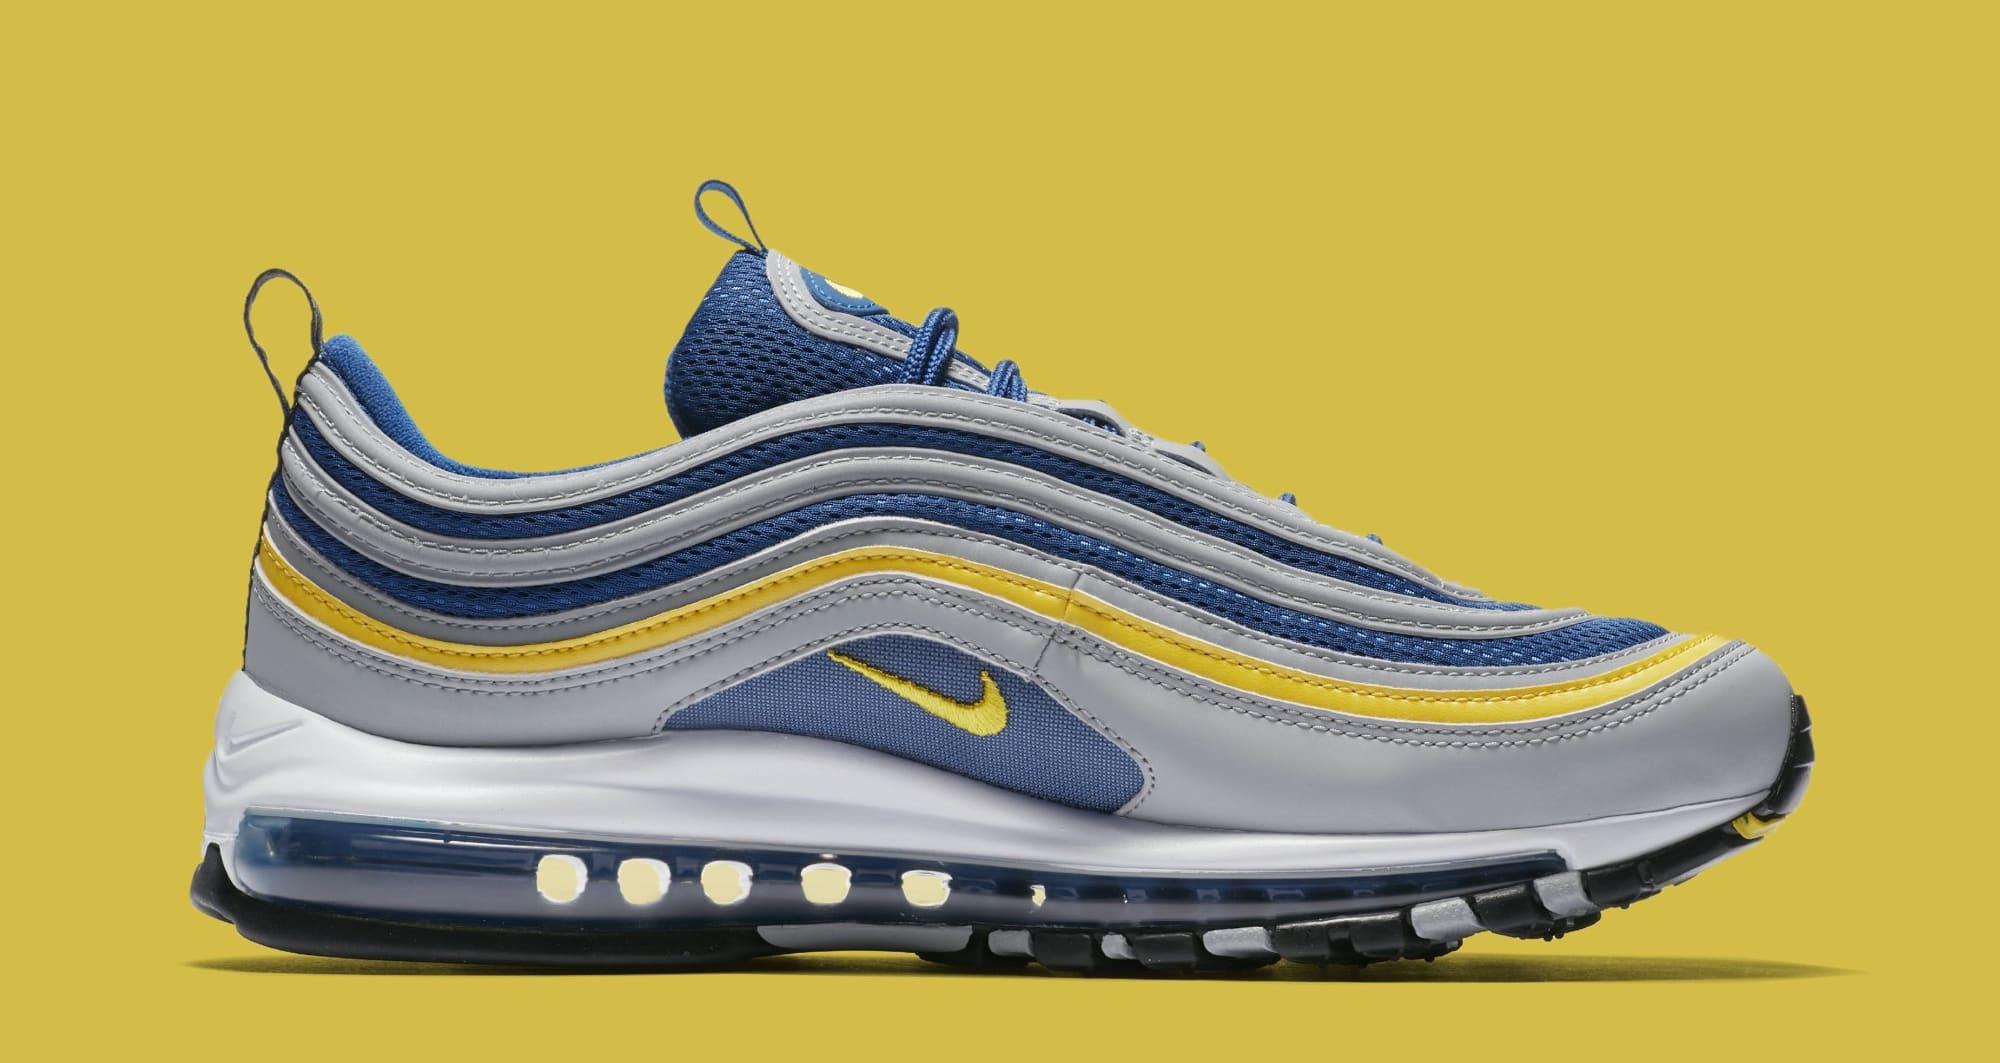 Nike Air Max 97 'Wolf Grey/Tour Yellow/Gym Blue' 921826-006 (Medial)